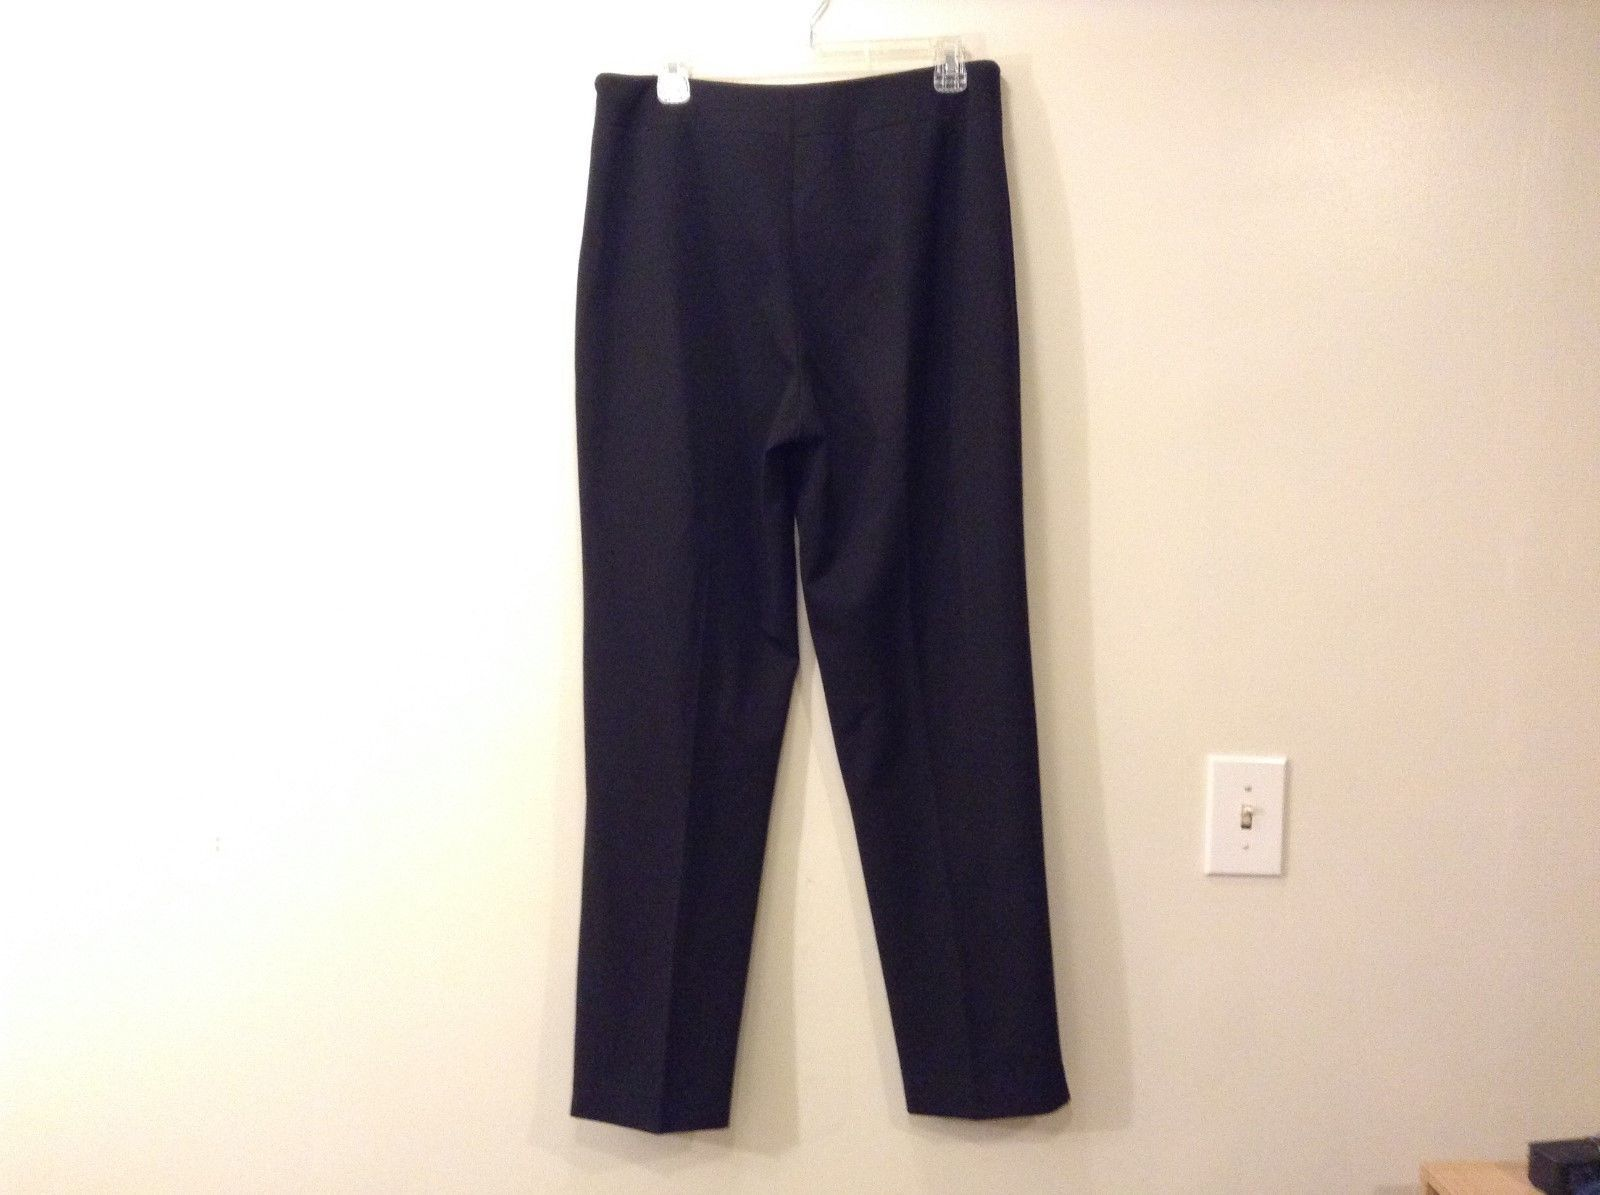 Ladies Saks Fifth Avenue Black Classic Pants Sz 12